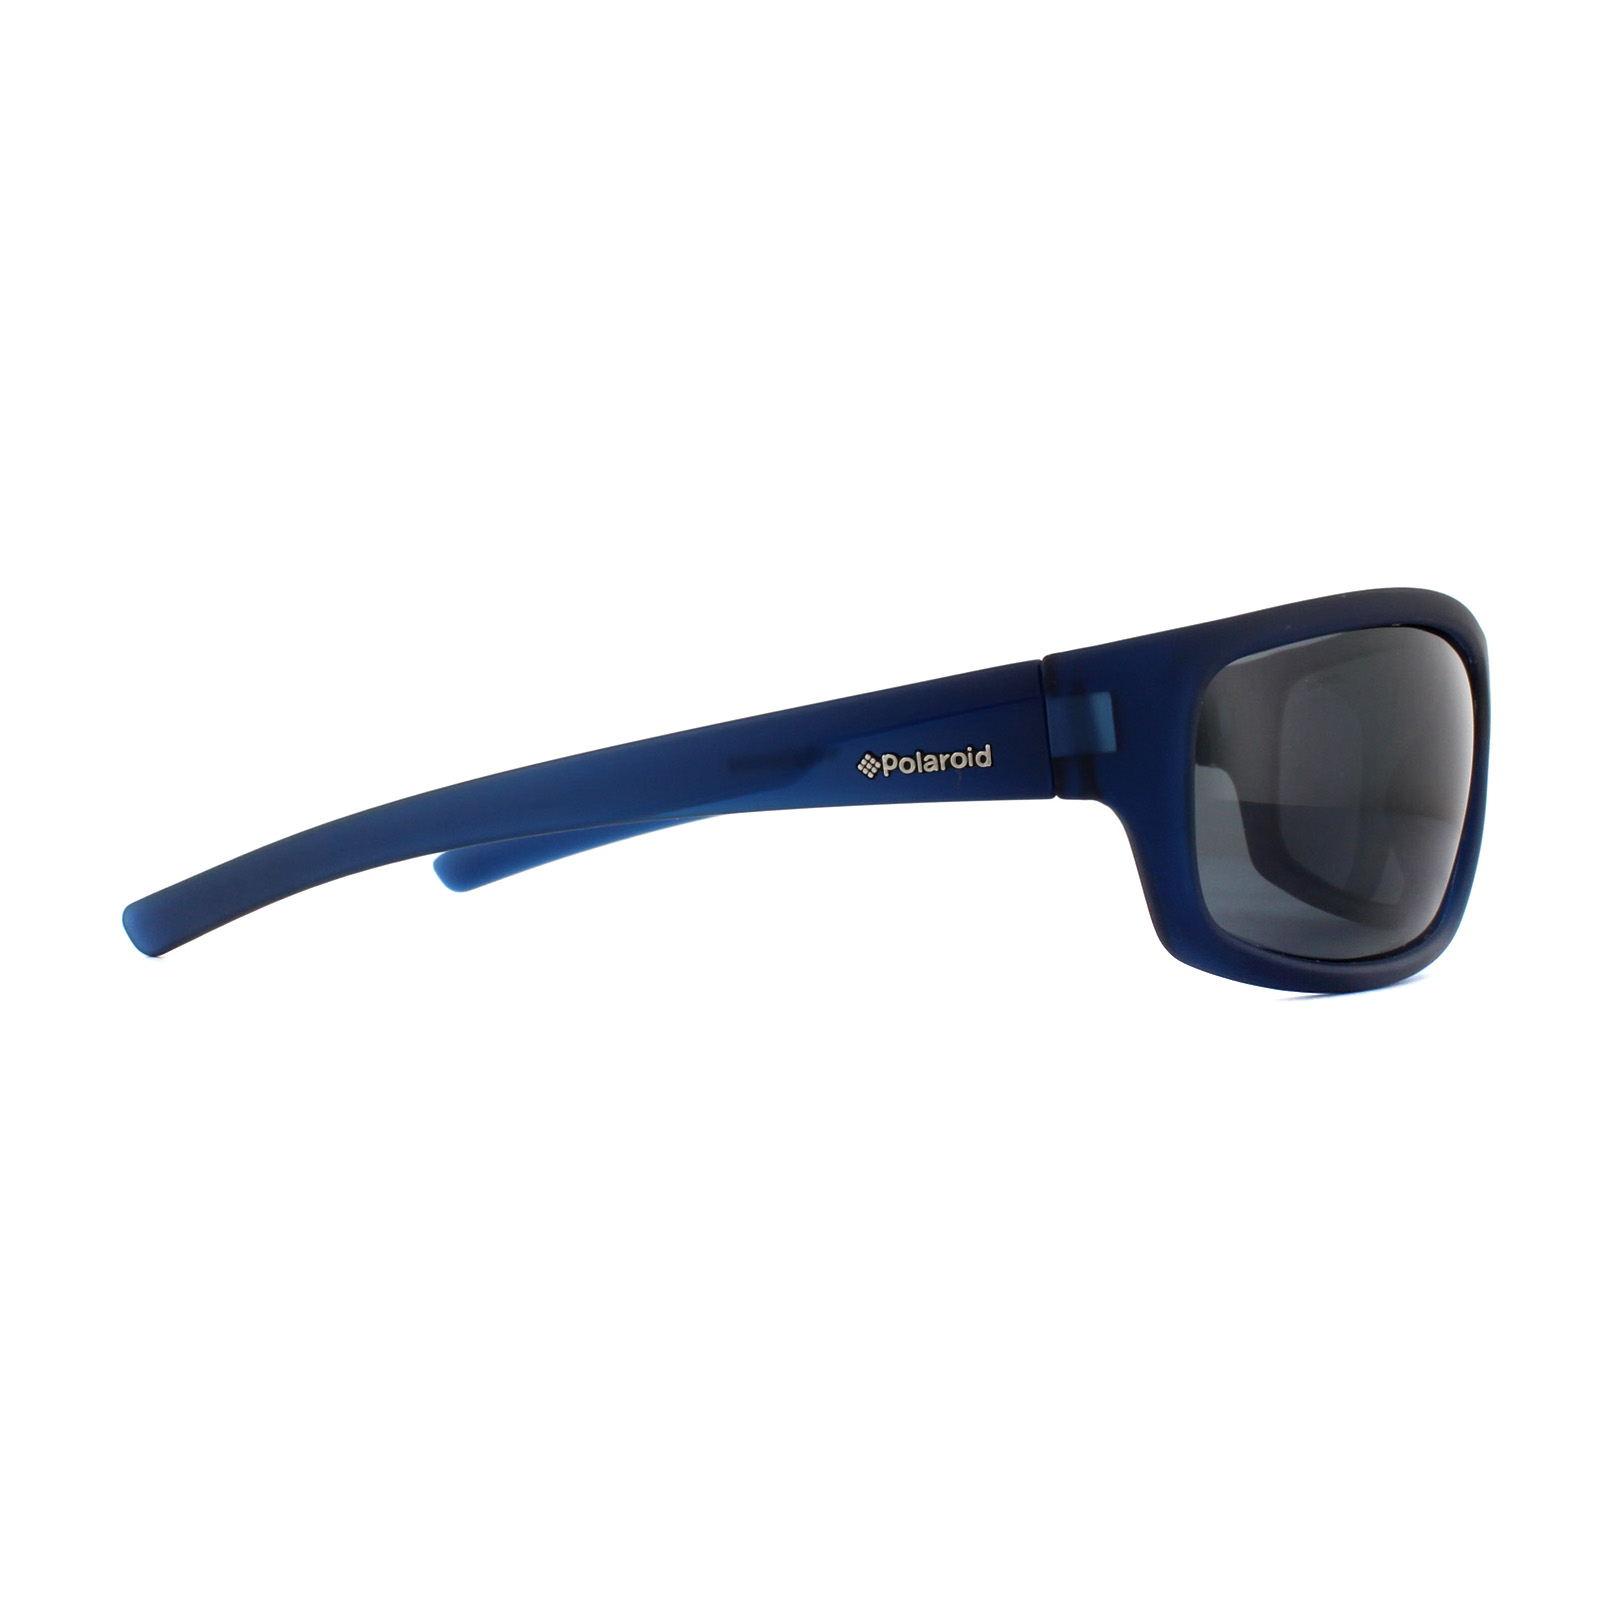 Sentinel Polaroid Sport Sunglasses P8411 148 Y2 Rubber Blue Grey Polarized 4079ece098